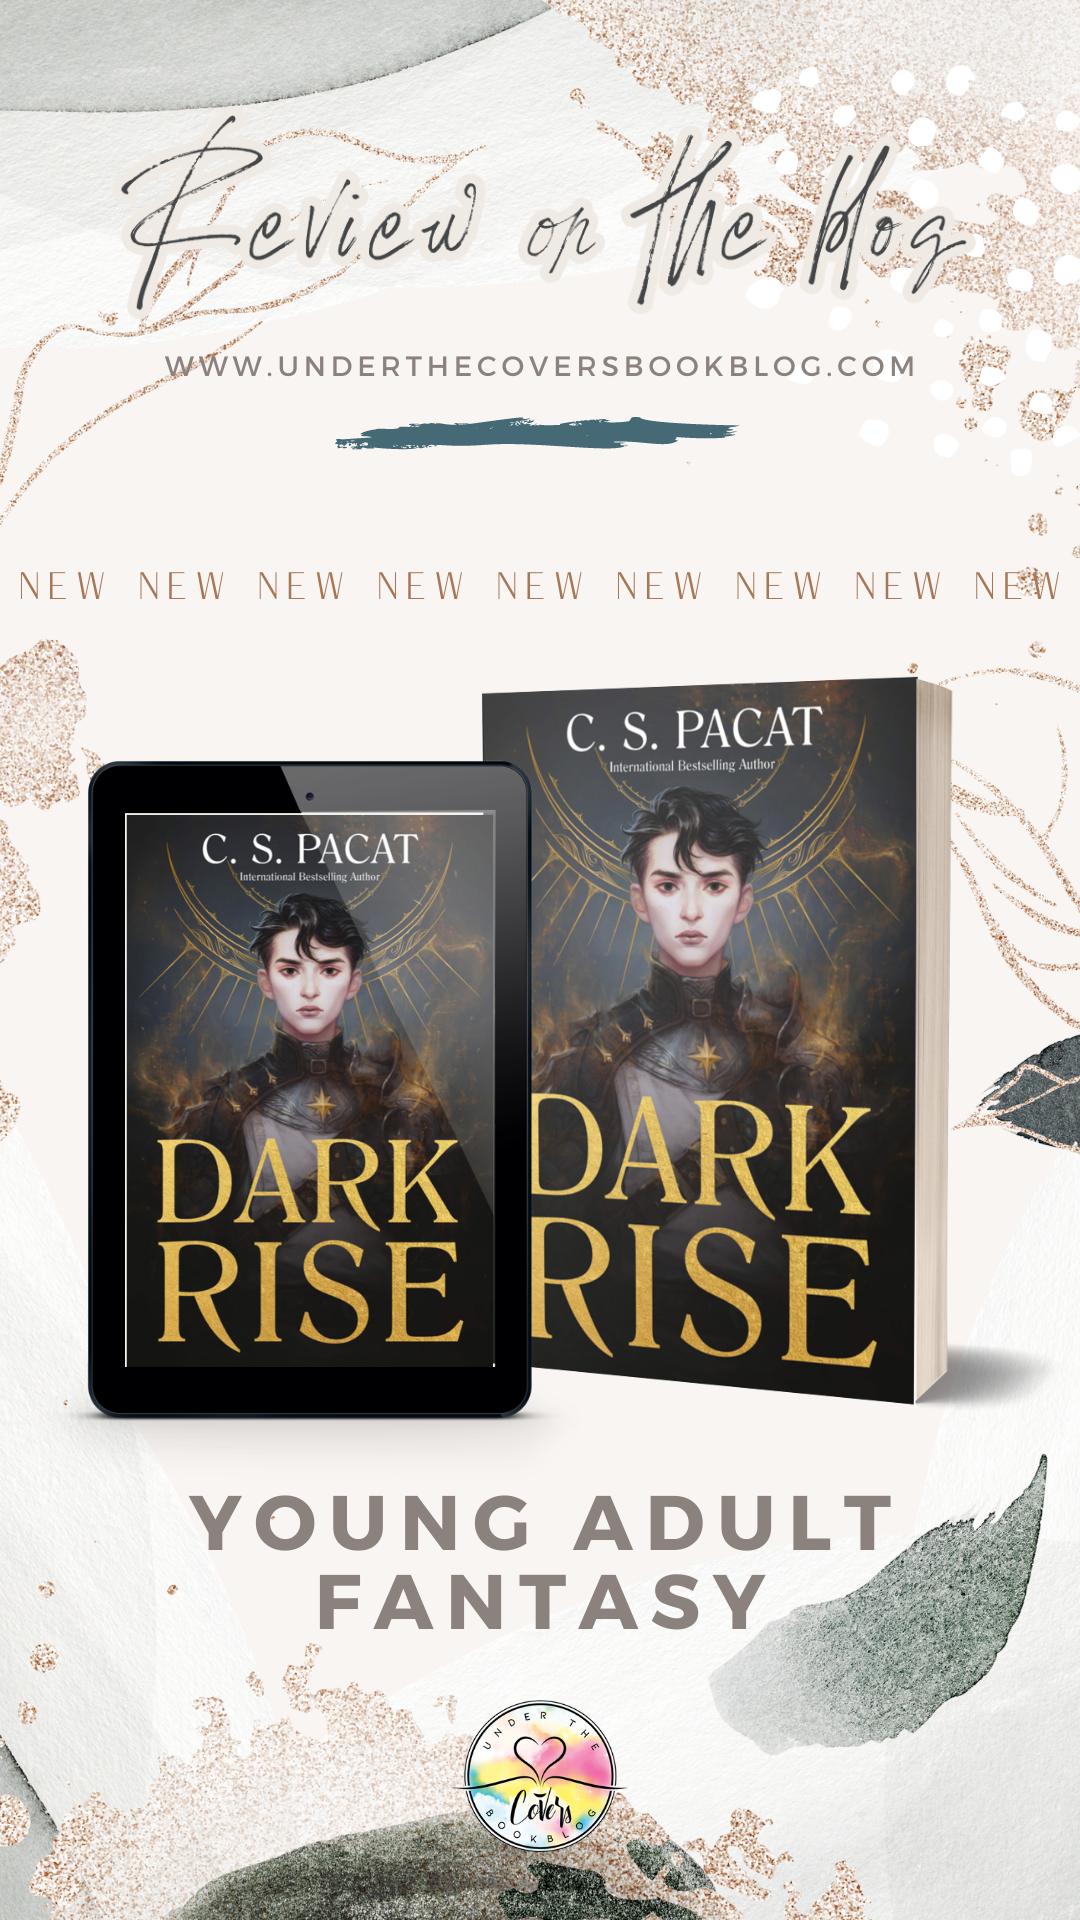 ARC Revew: Dark Rise by C.S. Pacat